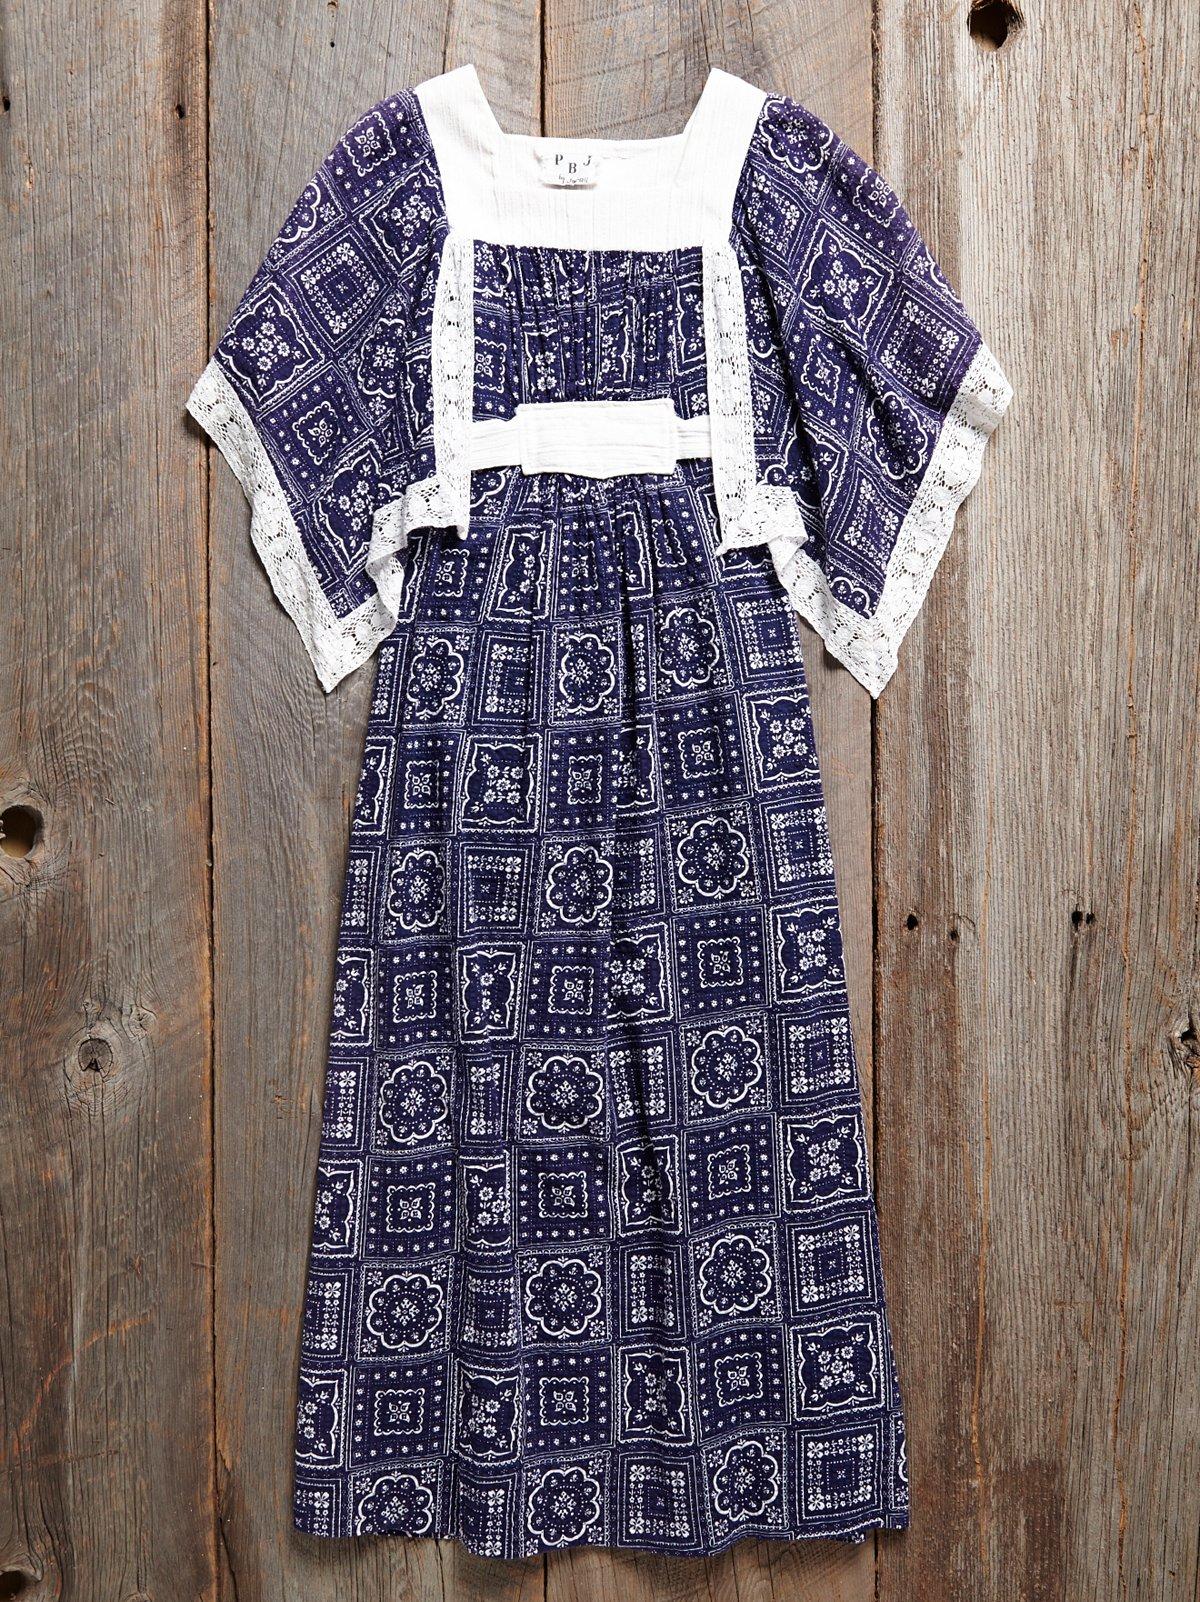 Vintage Embroidered Bandana Print Dress